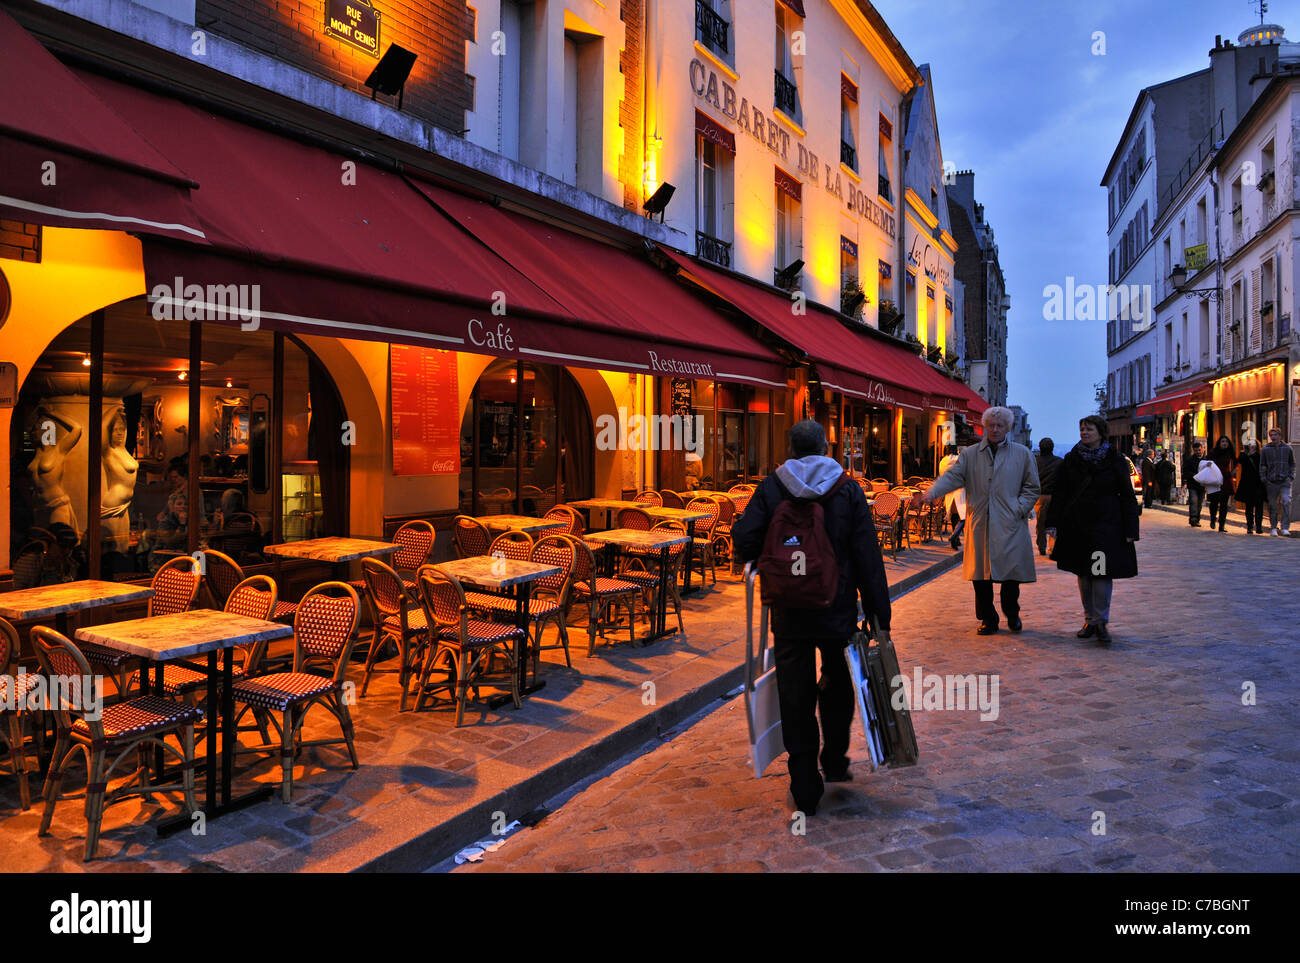 Street artist homebound, Montmartre, Paris, France, Europe - Stock Image